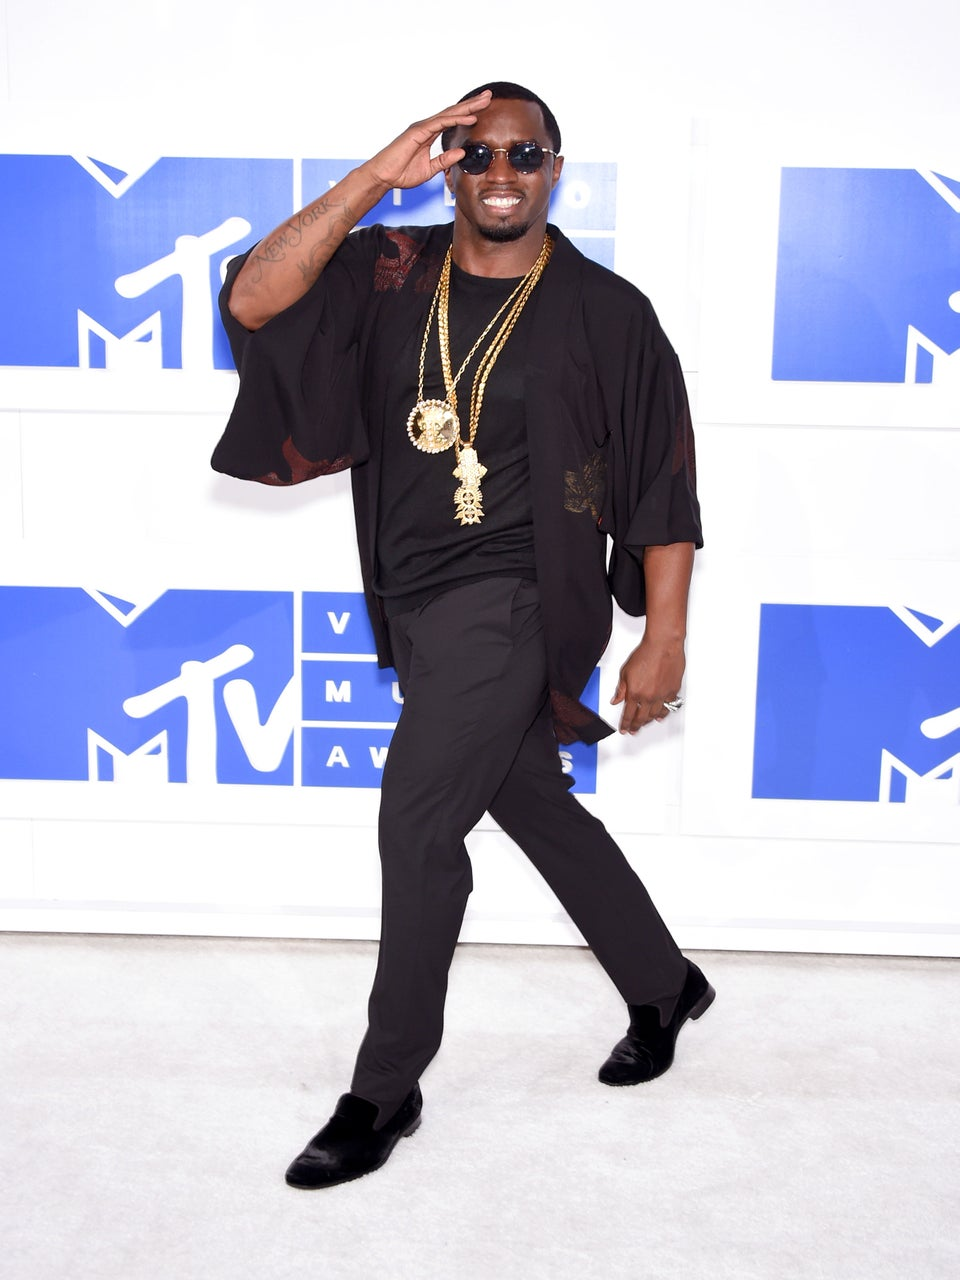 Diddy Rocks Kimono on VMAs Red Carpet